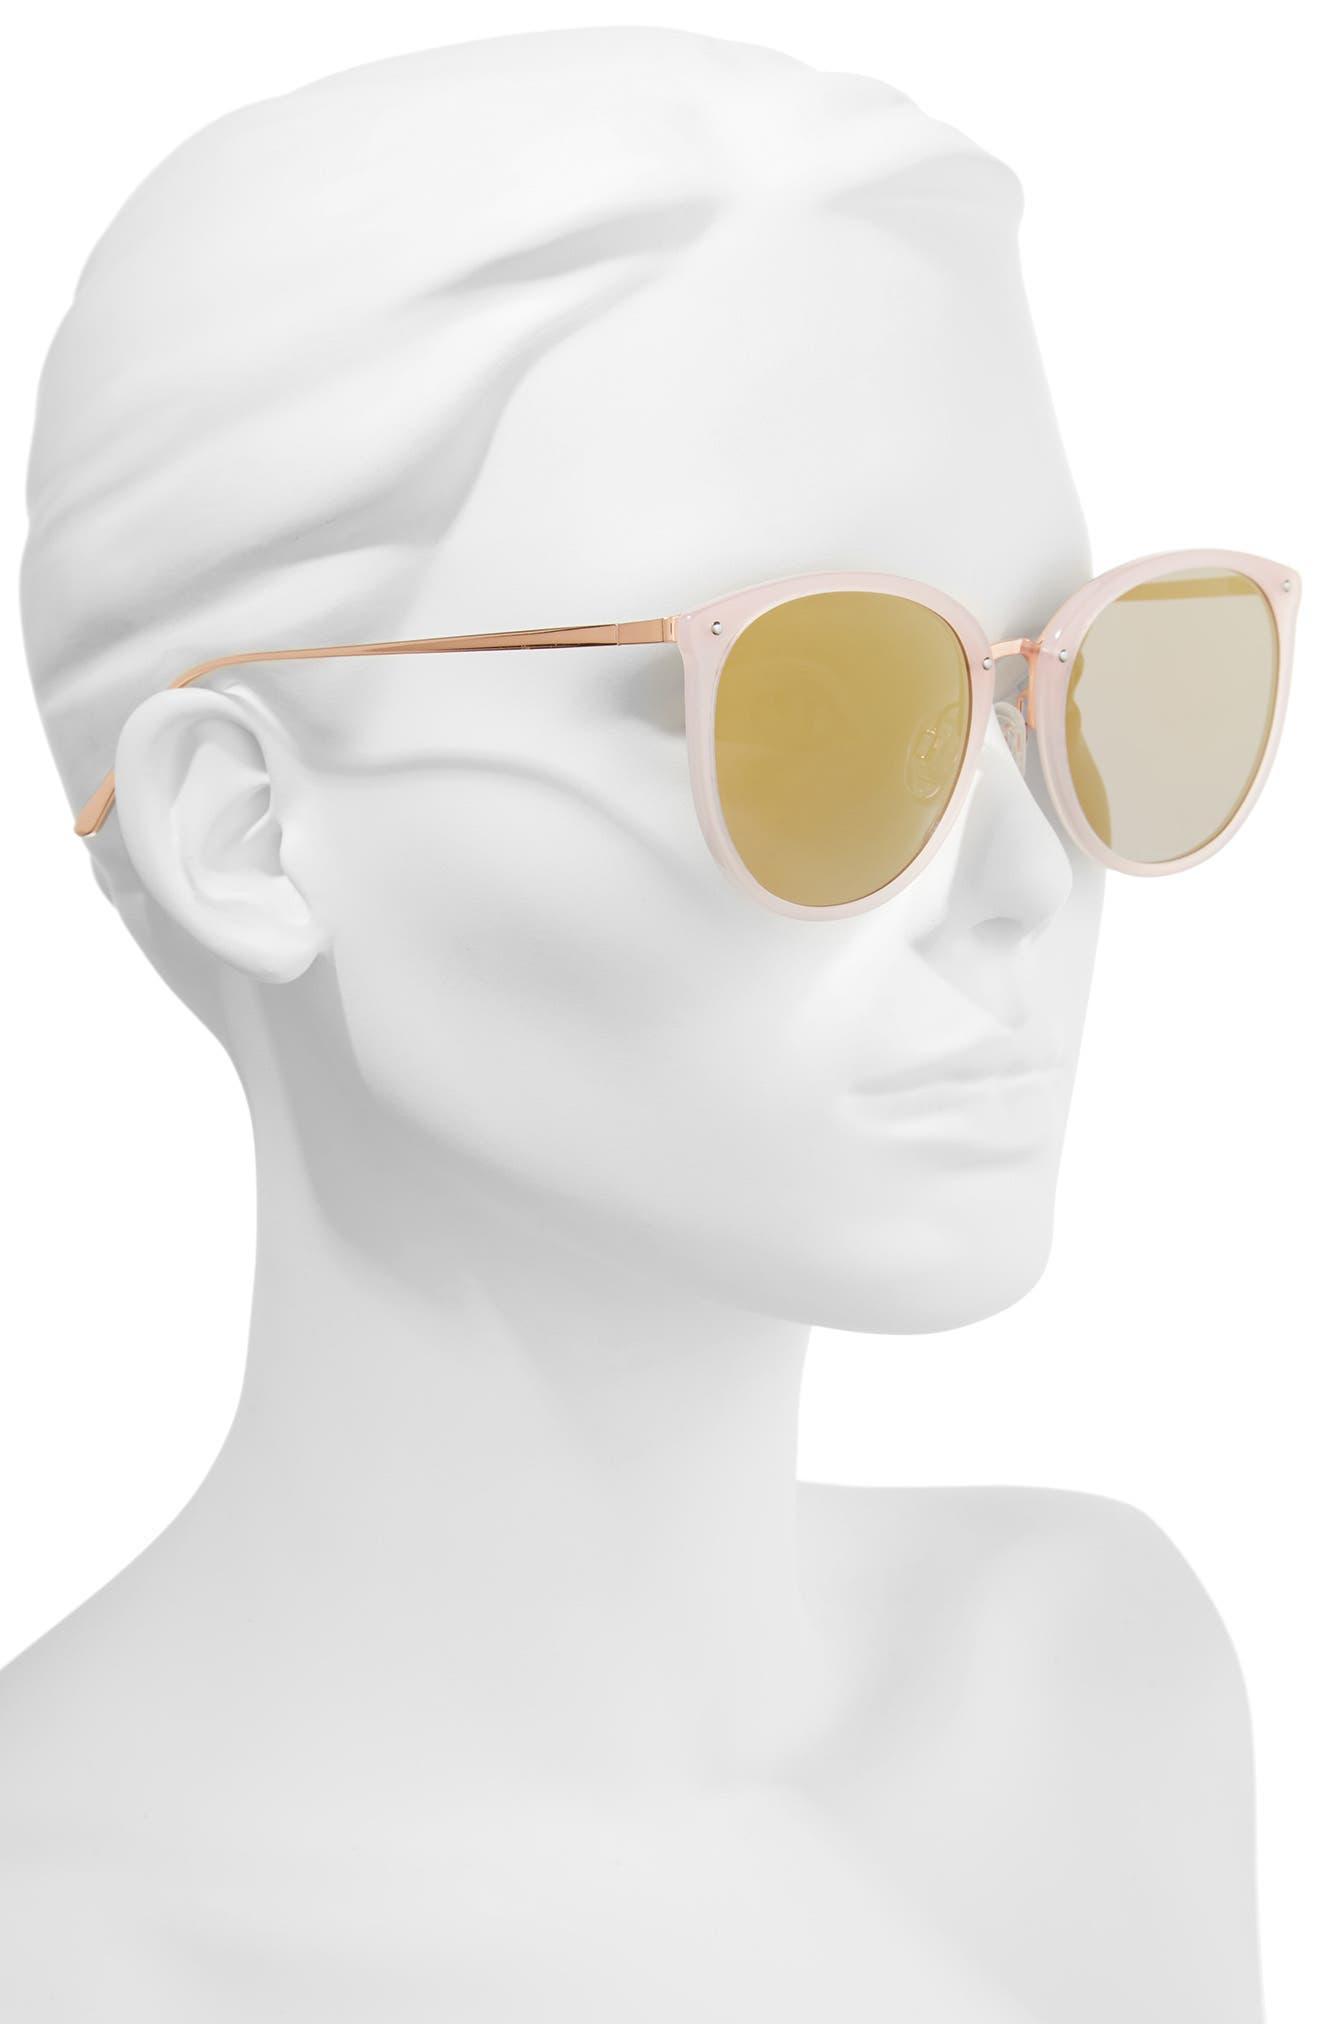 Key Largo 57mm Sunglasses,                             Alternate thumbnail 2, color,                             Milky Pink